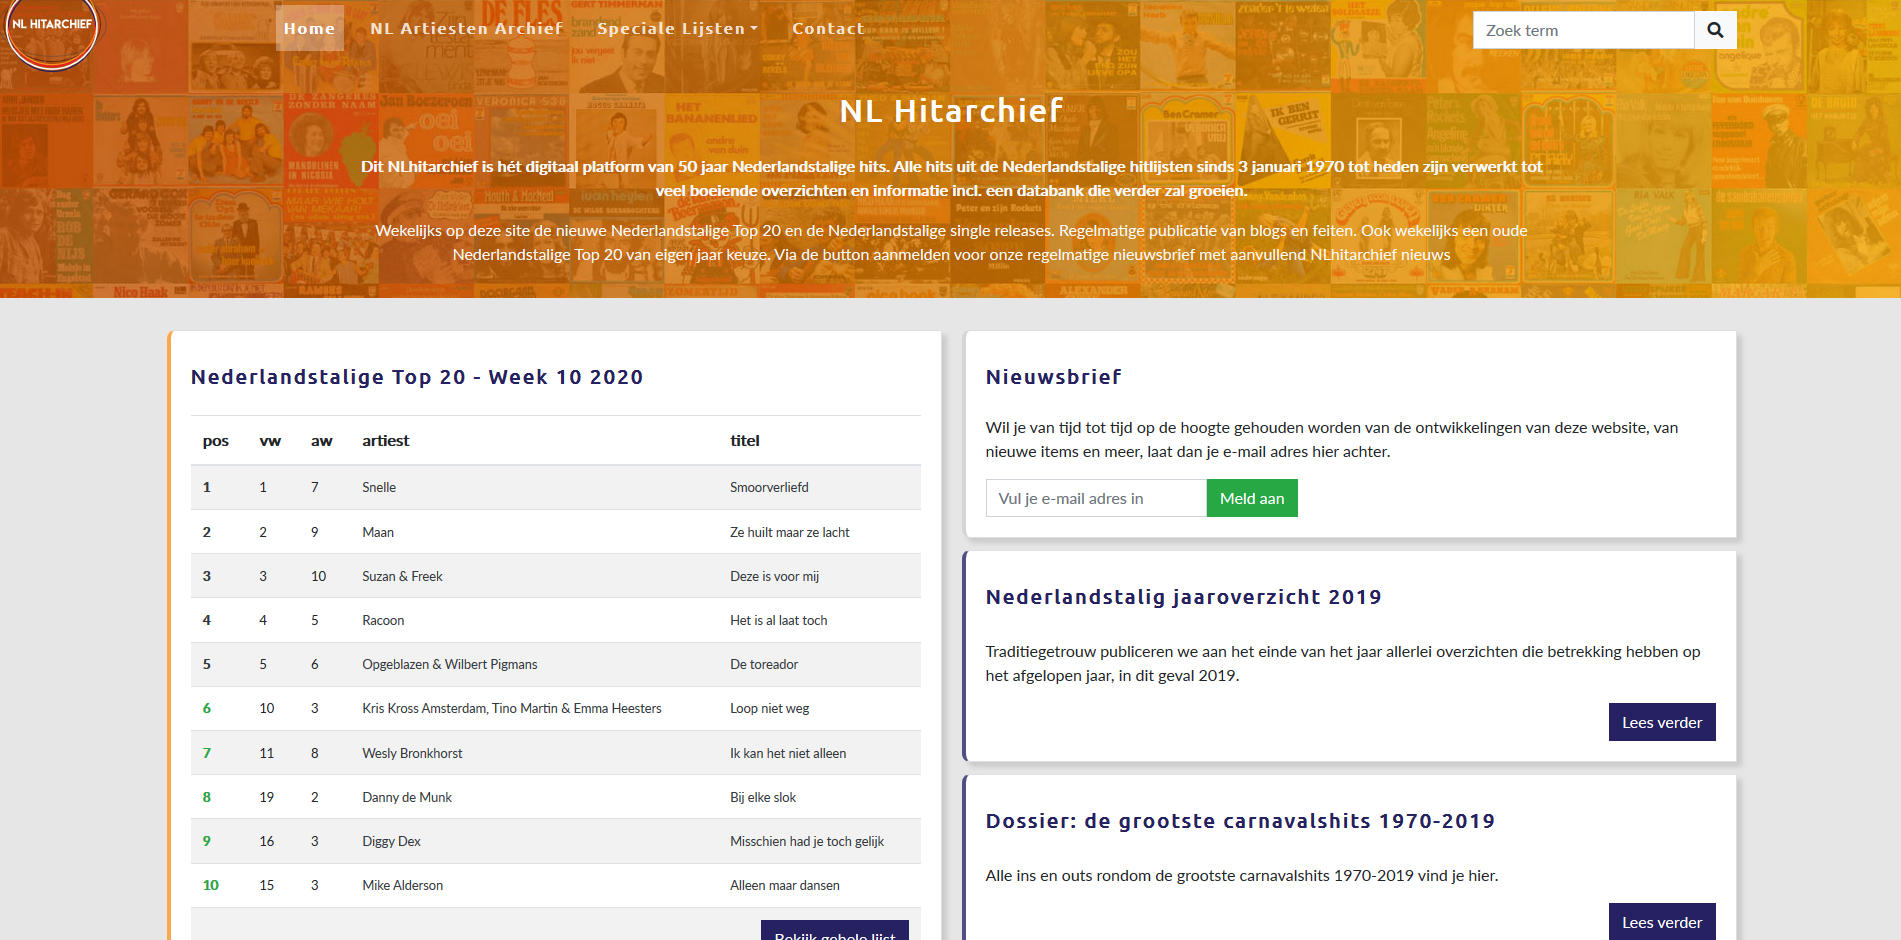 NLhitarchief.nl